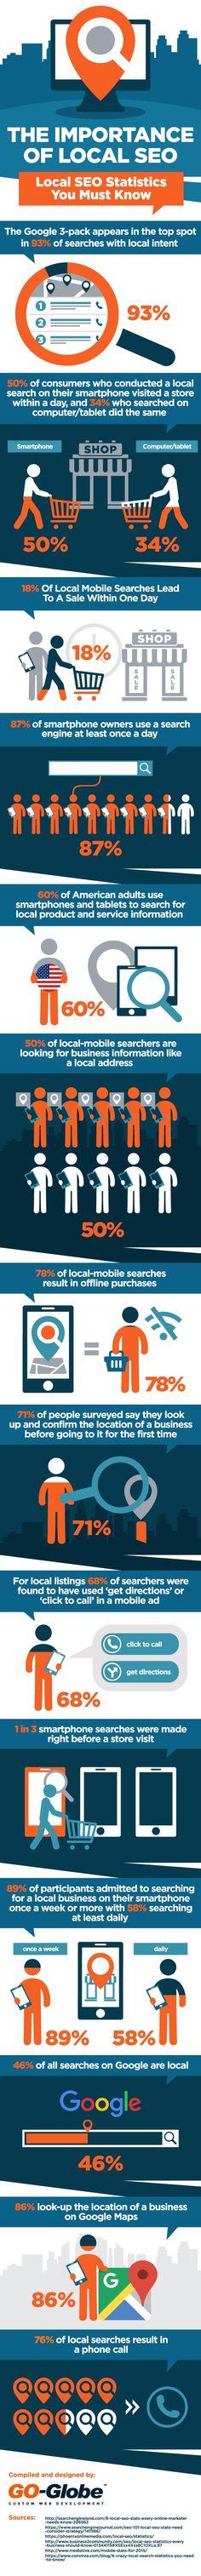 16 Stats That Prove the Importance of Local SEO [Infographic] Inbound Marketing, Marketing Digital, Business Marketing, Content Marketing, Marketing Website, Online Marketing, Affiliate Marketing, Mobile Marketing, Media Marketing